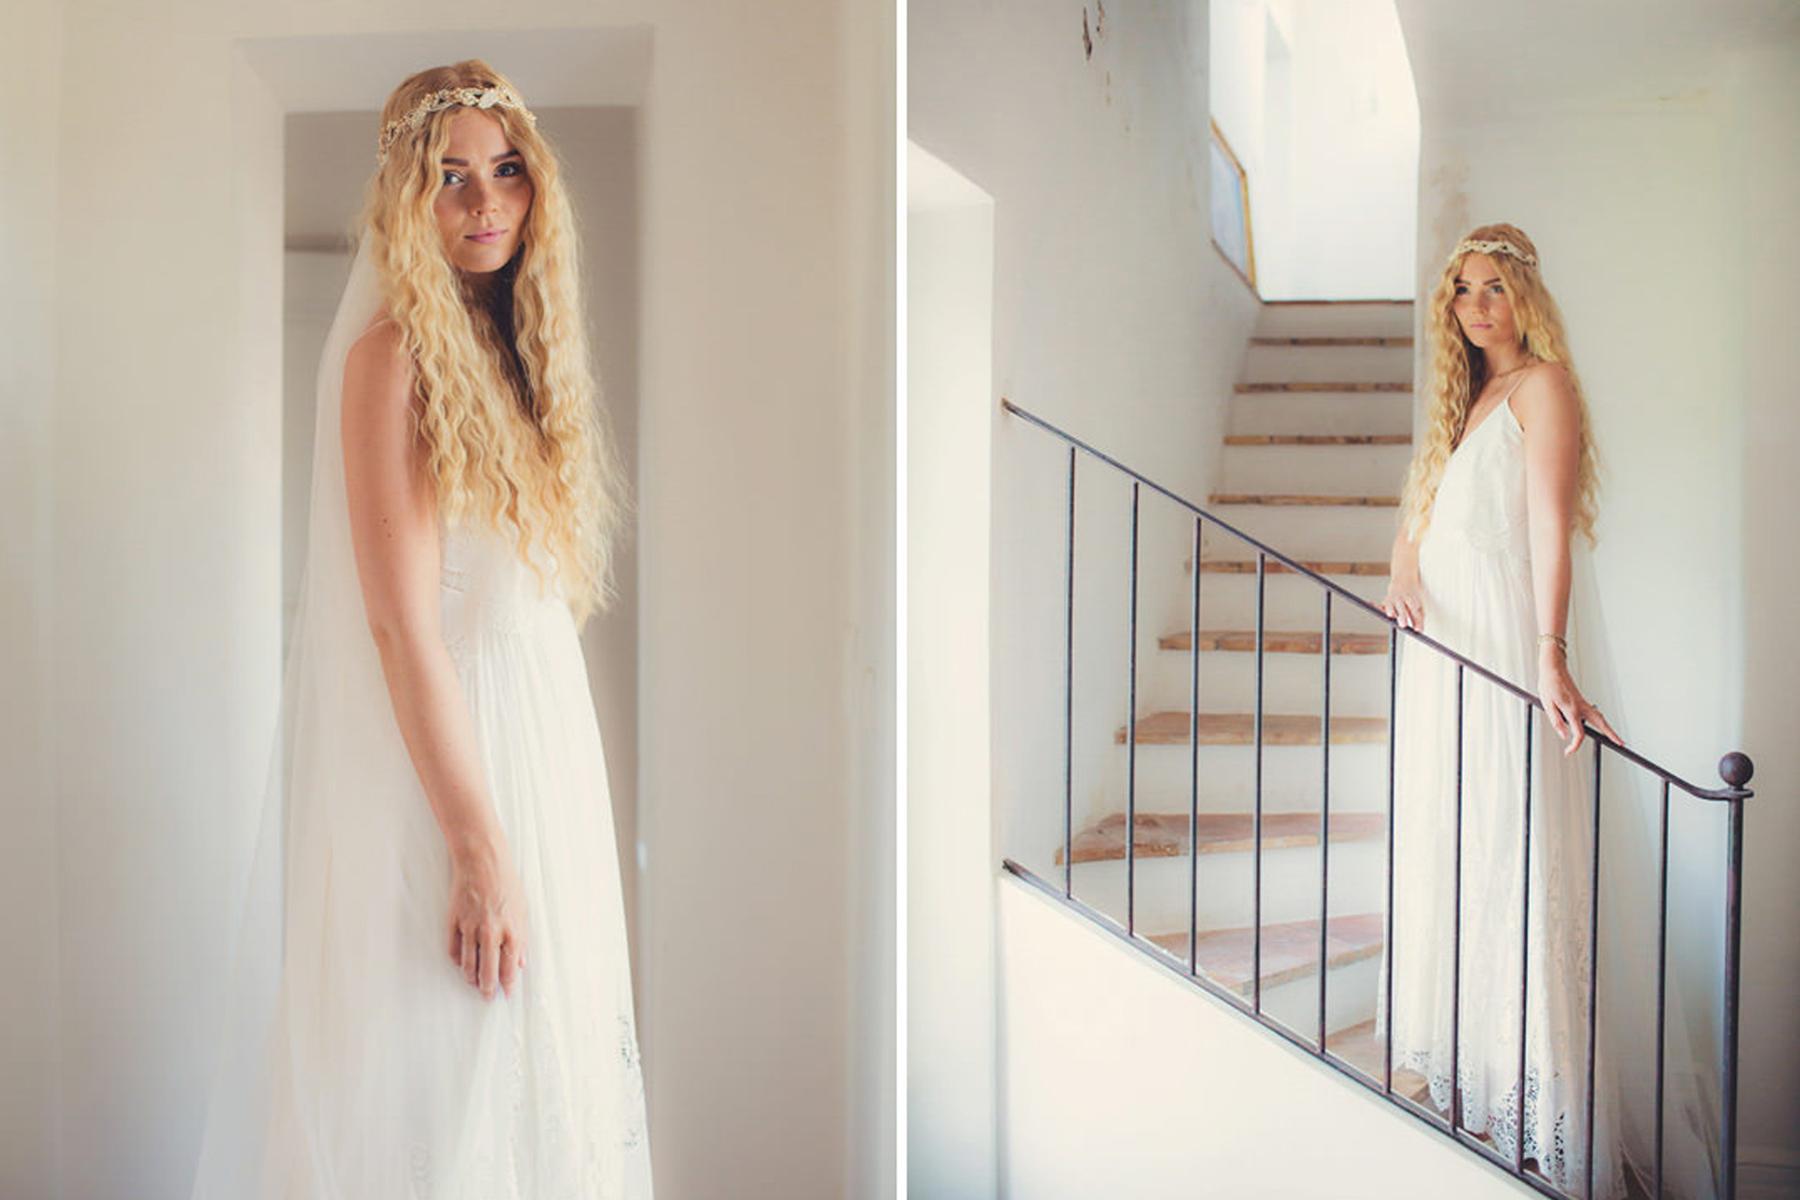 California Wedding photographer -  ©Anne-Claire Brun 211test2 1800 1200